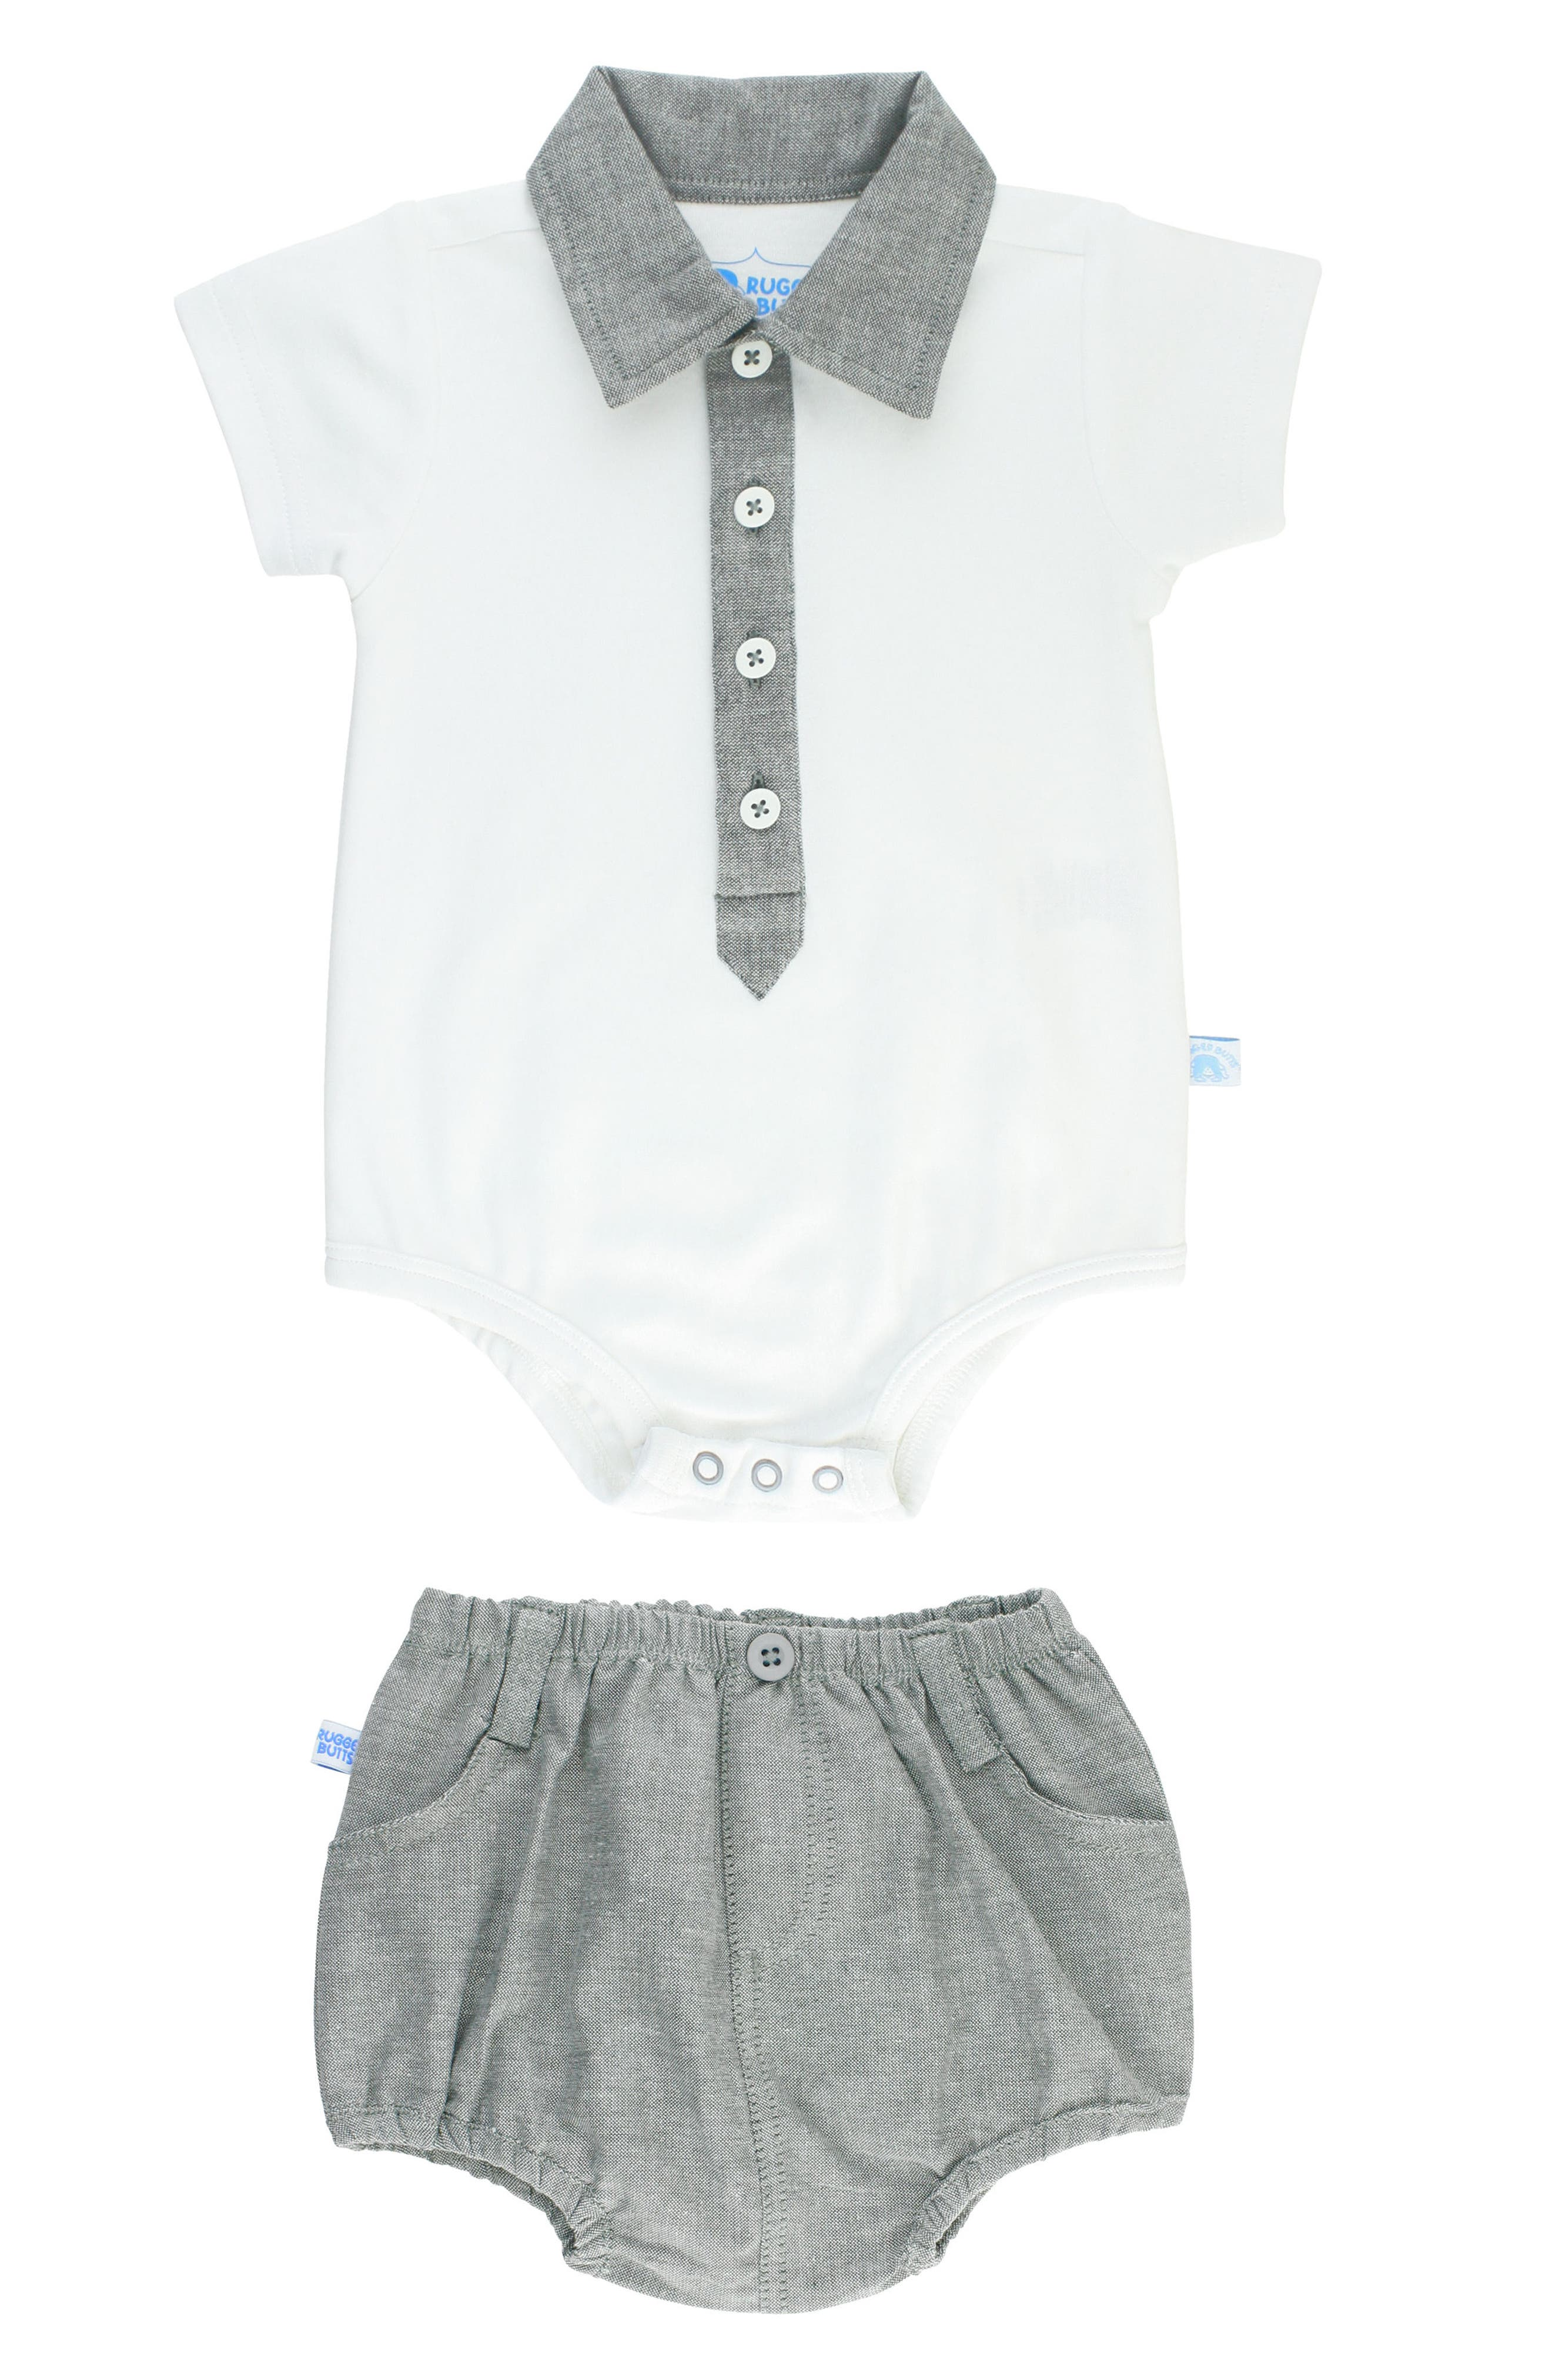 Alternate Image 1 Selected - RuggedButts Polo Bodysuit & Chambray Shorts Set (Baby Boys)